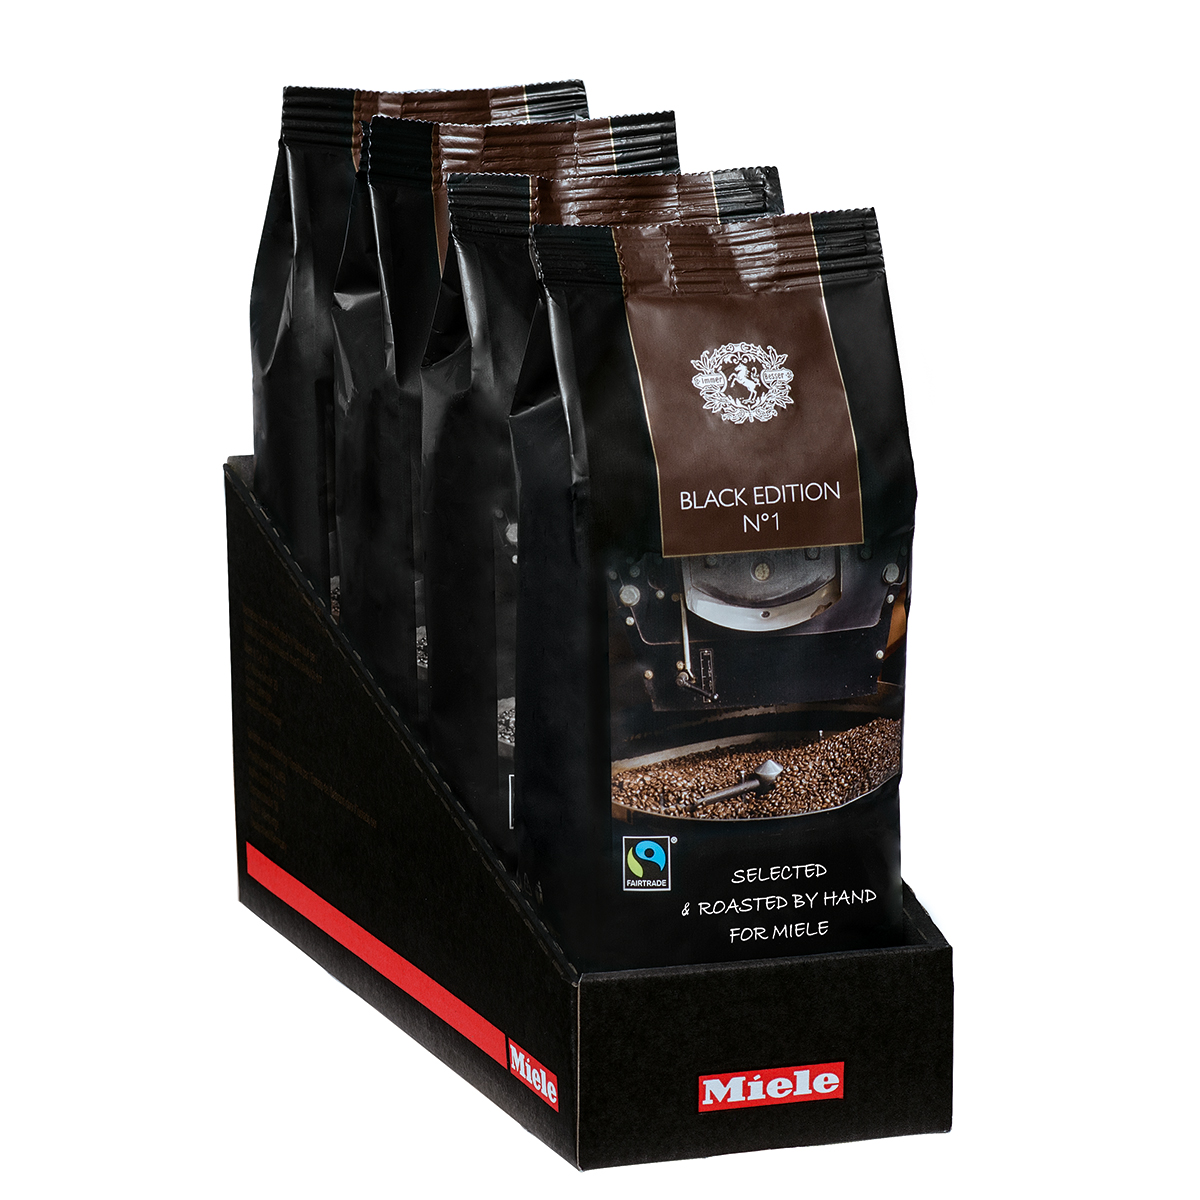 Image of   Miele kaffebønner - Black Edition no 1 kaffe - 4 x 250 g